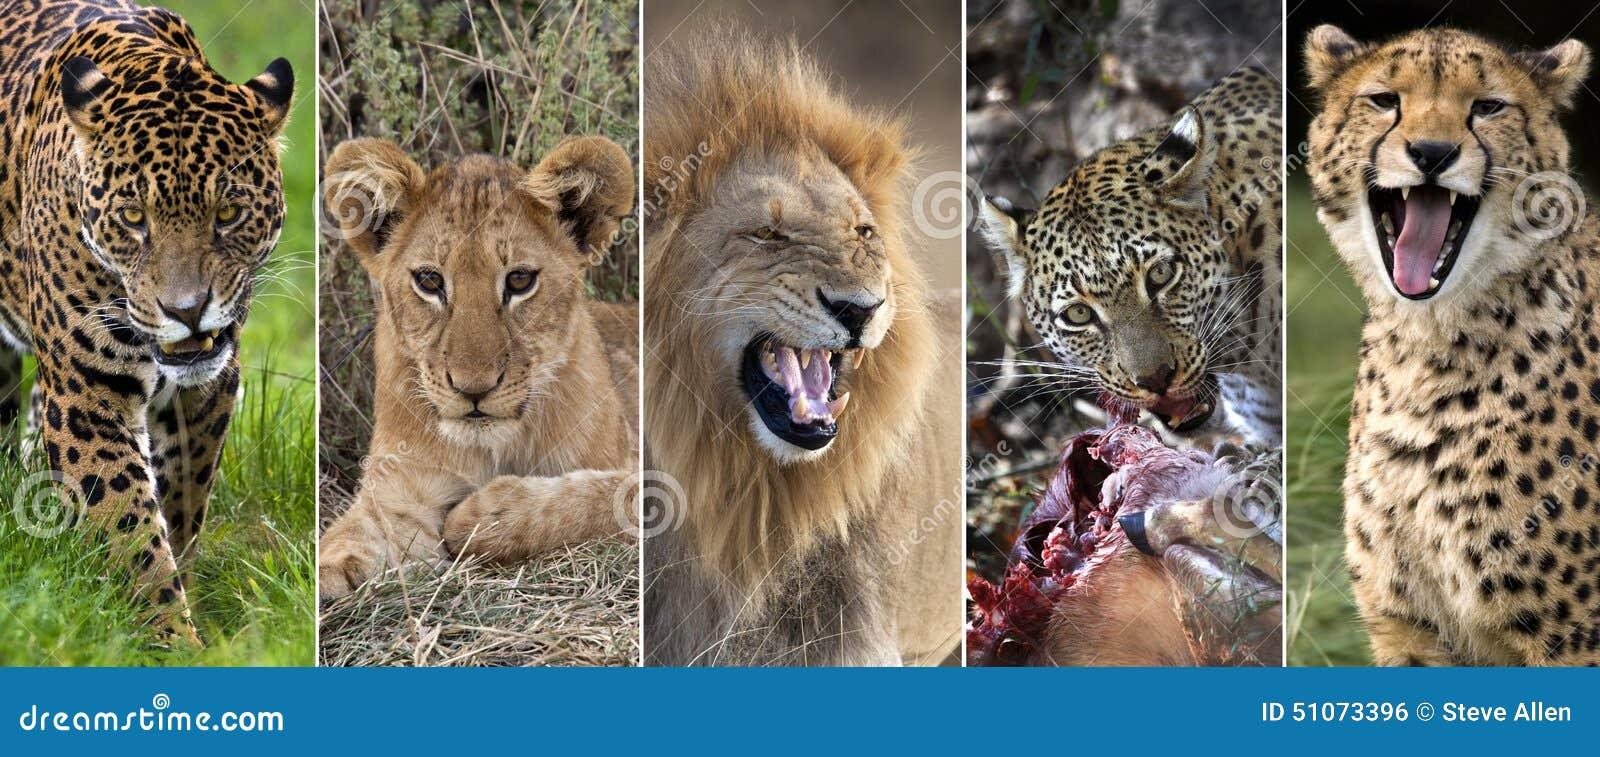 Wildlife - Big Cats